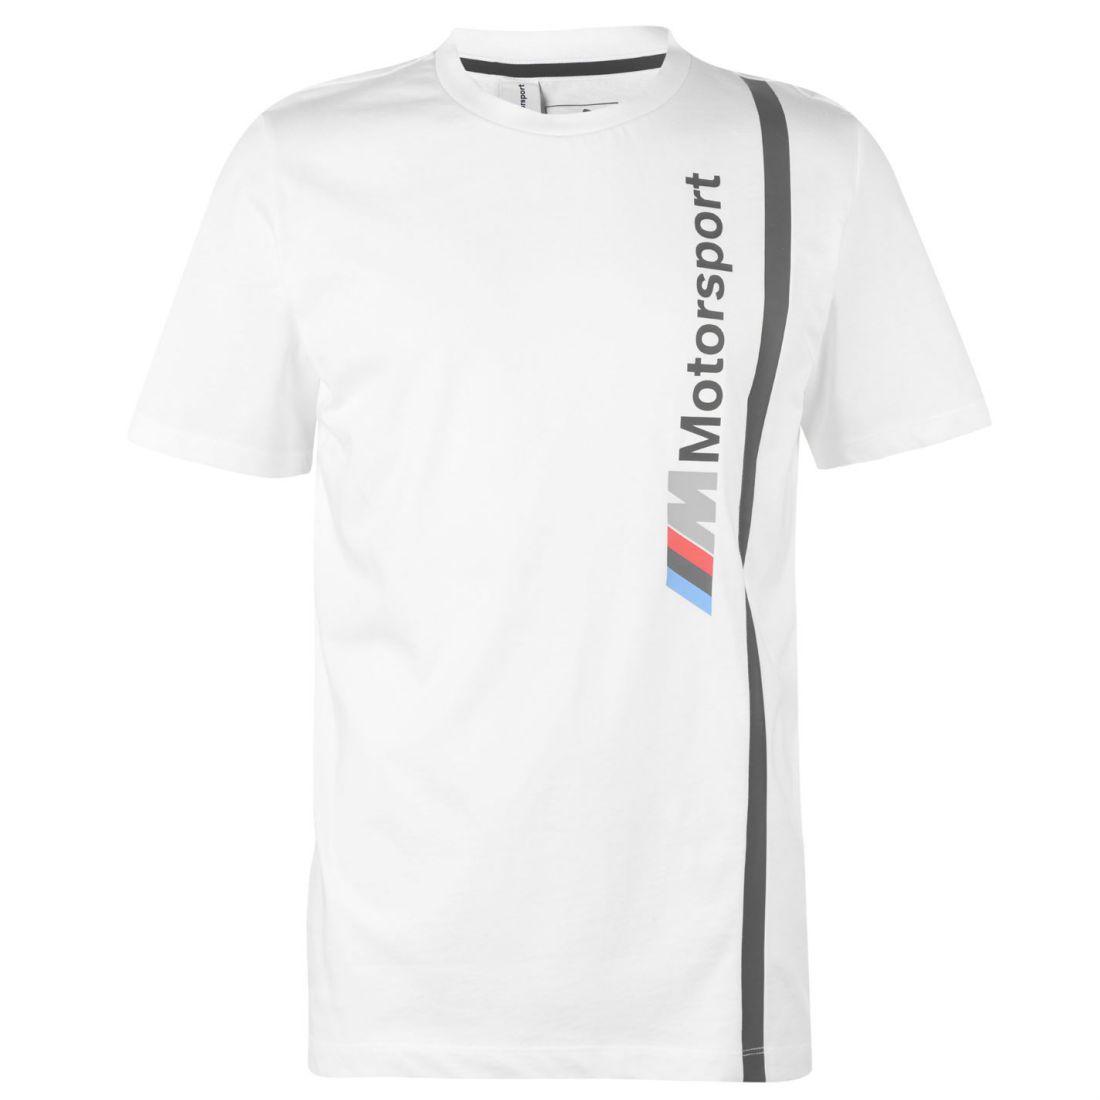 Puma Mens BMW Logo T Shirt Crew Neck Tee Top Short Sleeve Round ... 1a95ad375db